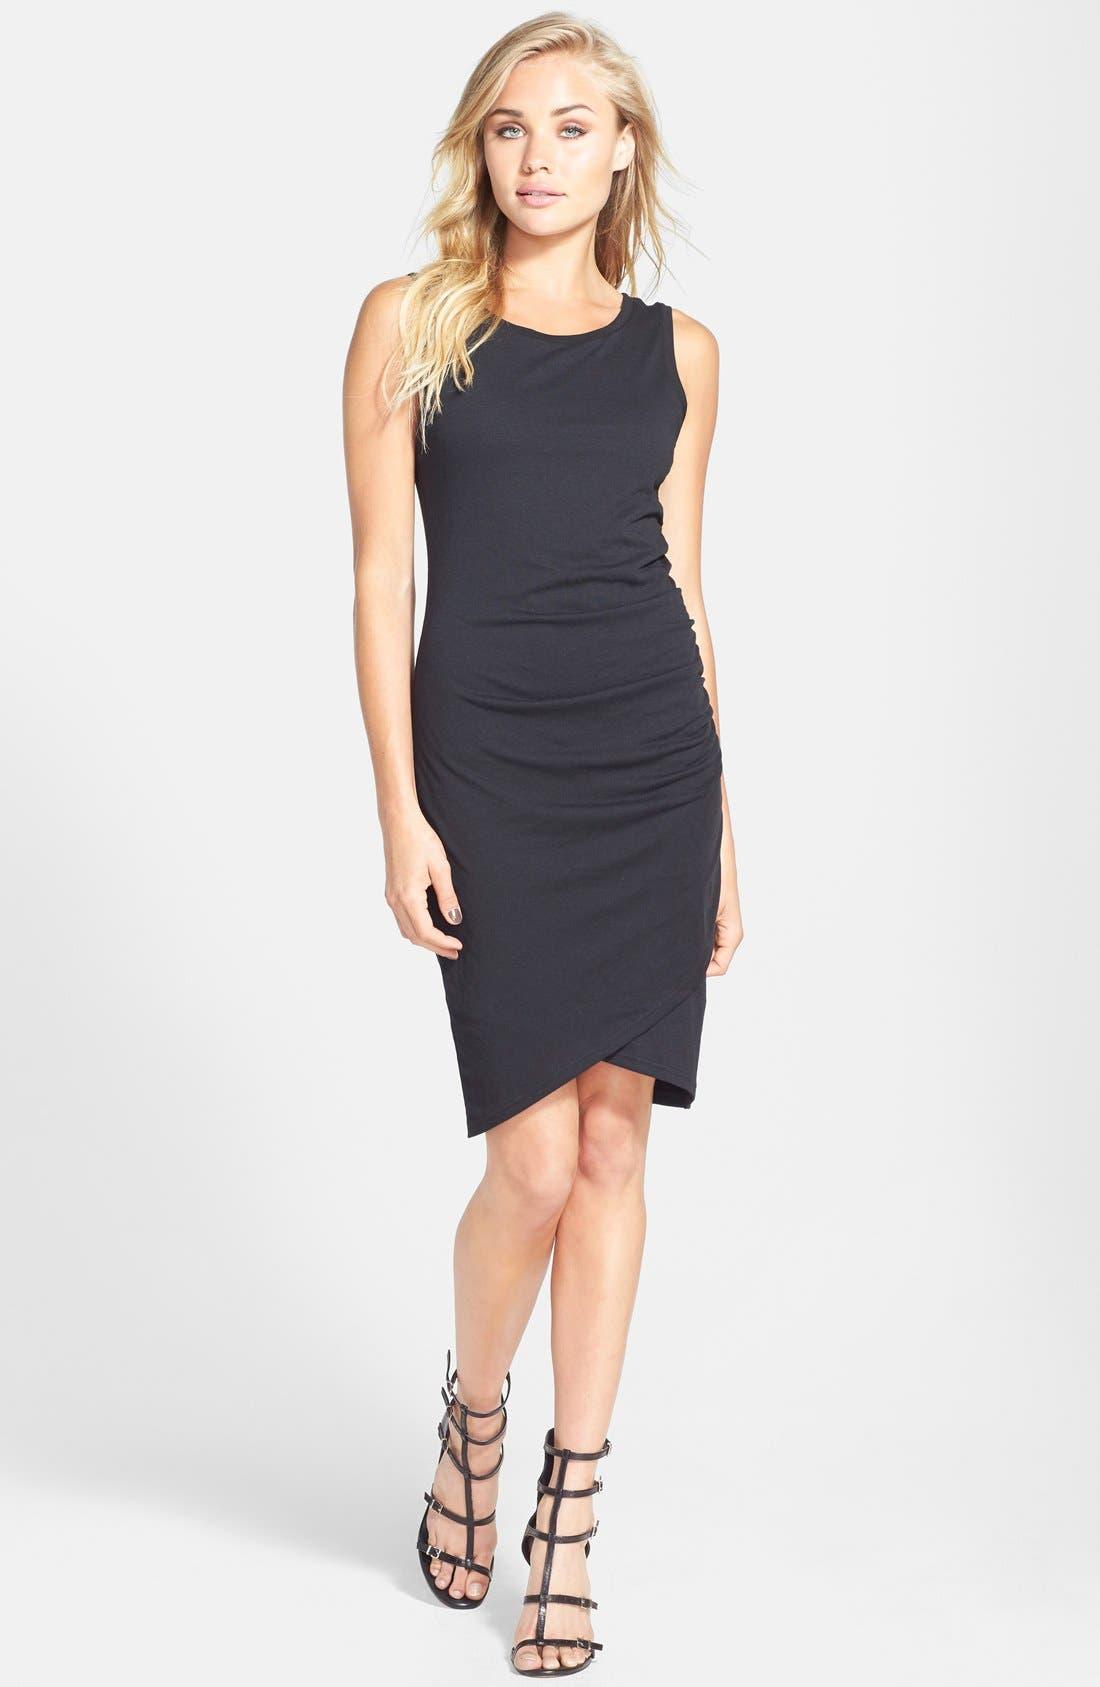 Ruched Body-Con Tank Dress,                             Main thumbnail 1, color,                             BLACK